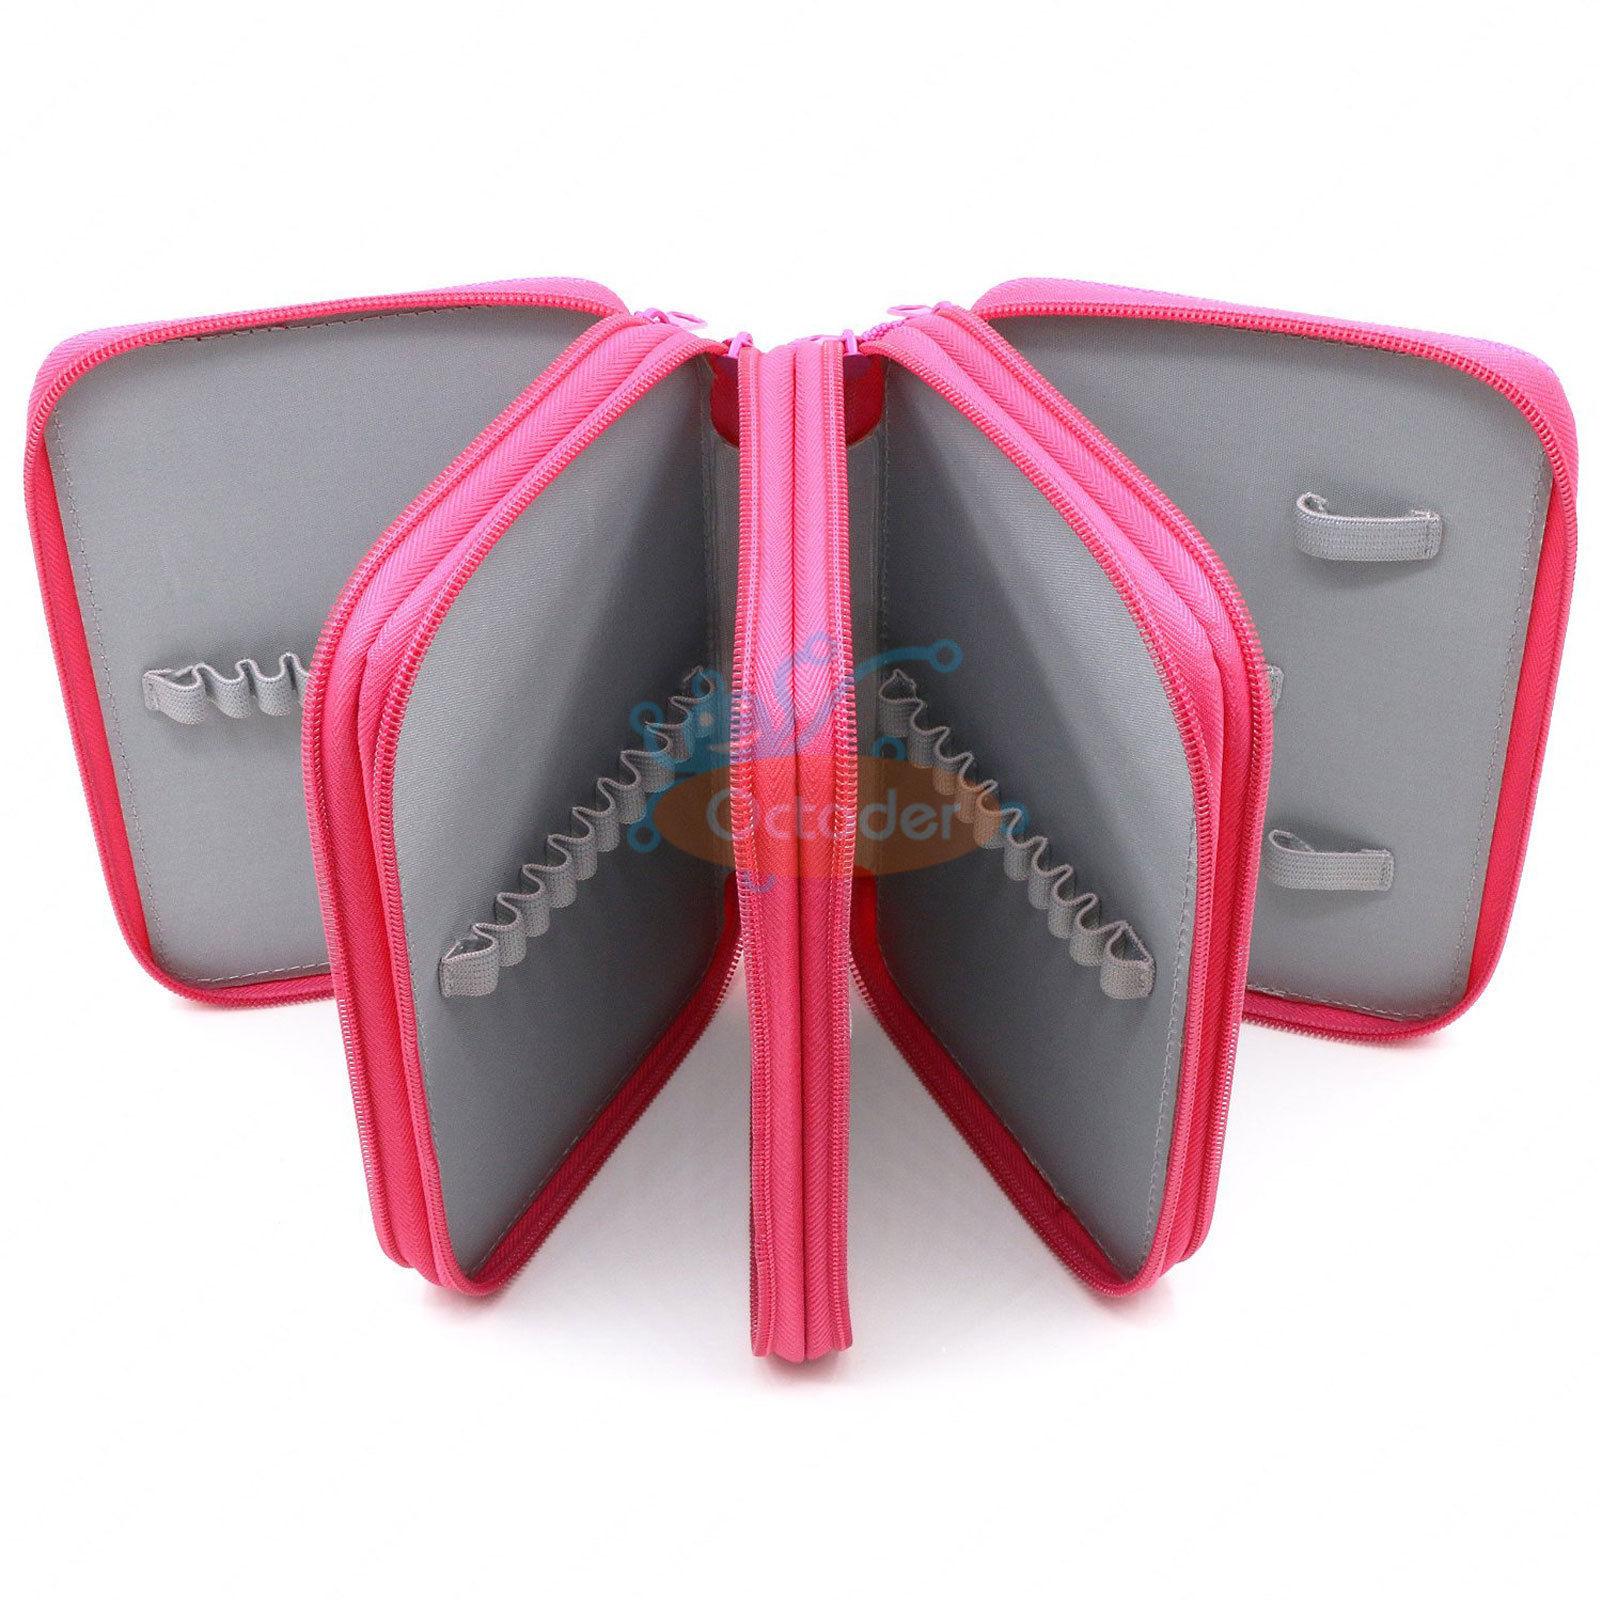 4-Layers-High-Capacity-Pencil-Brush-Case-Box-Pen-Pouch-Bag-Makeup-Storage-Bag thumbnail 19